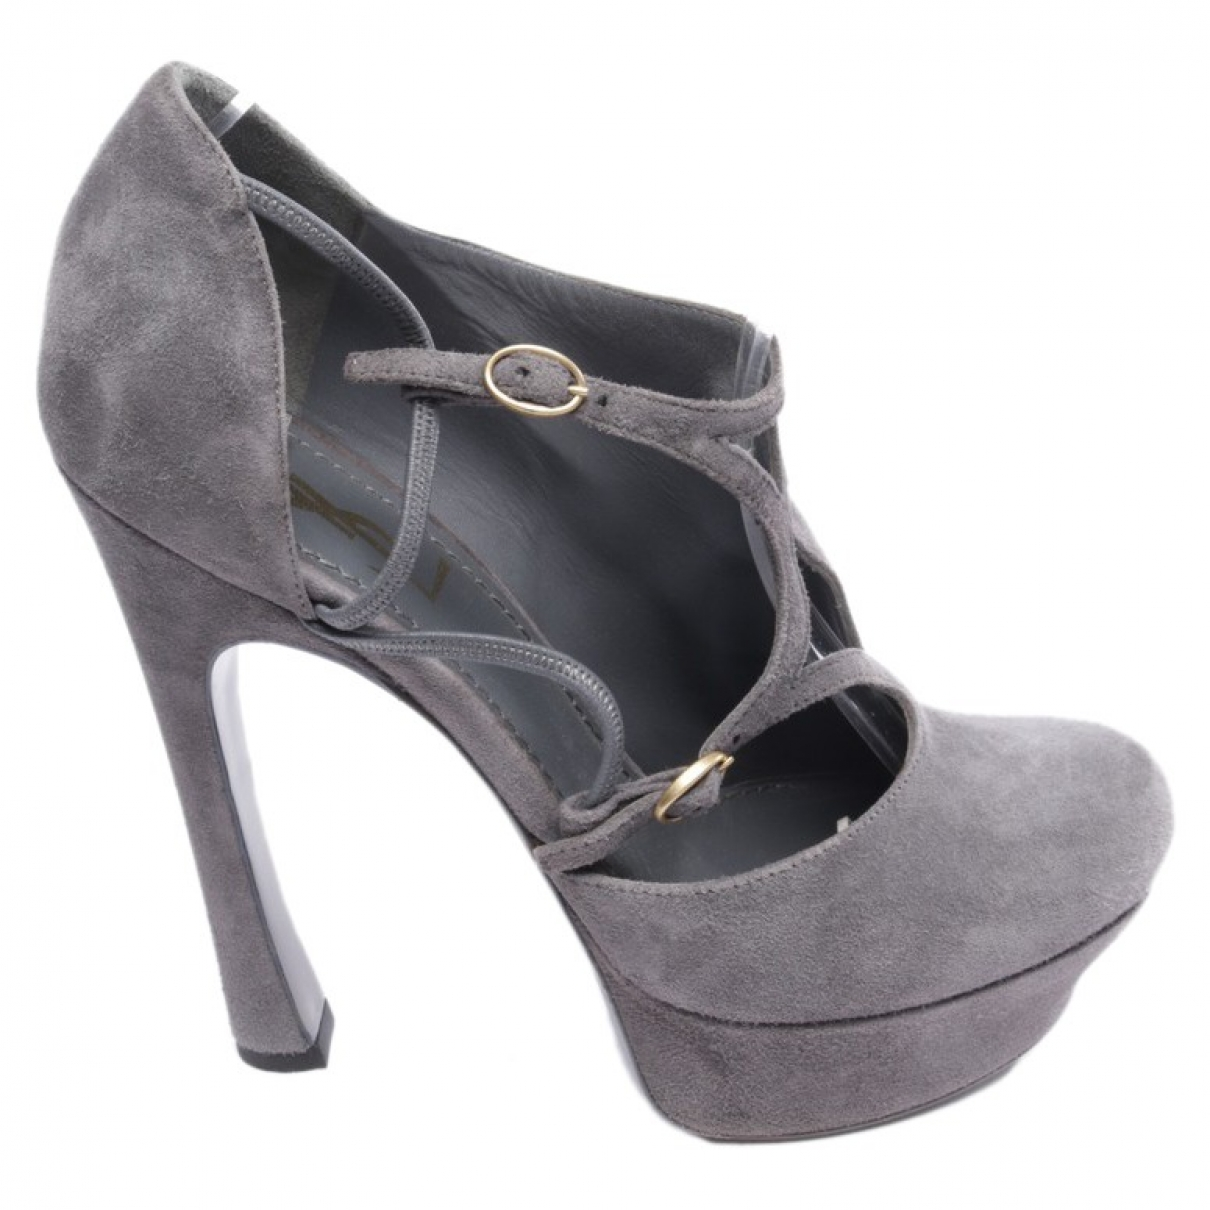 Yves Saint Laurent Trib Too Grey Suede Heels for Women 38.5 EU